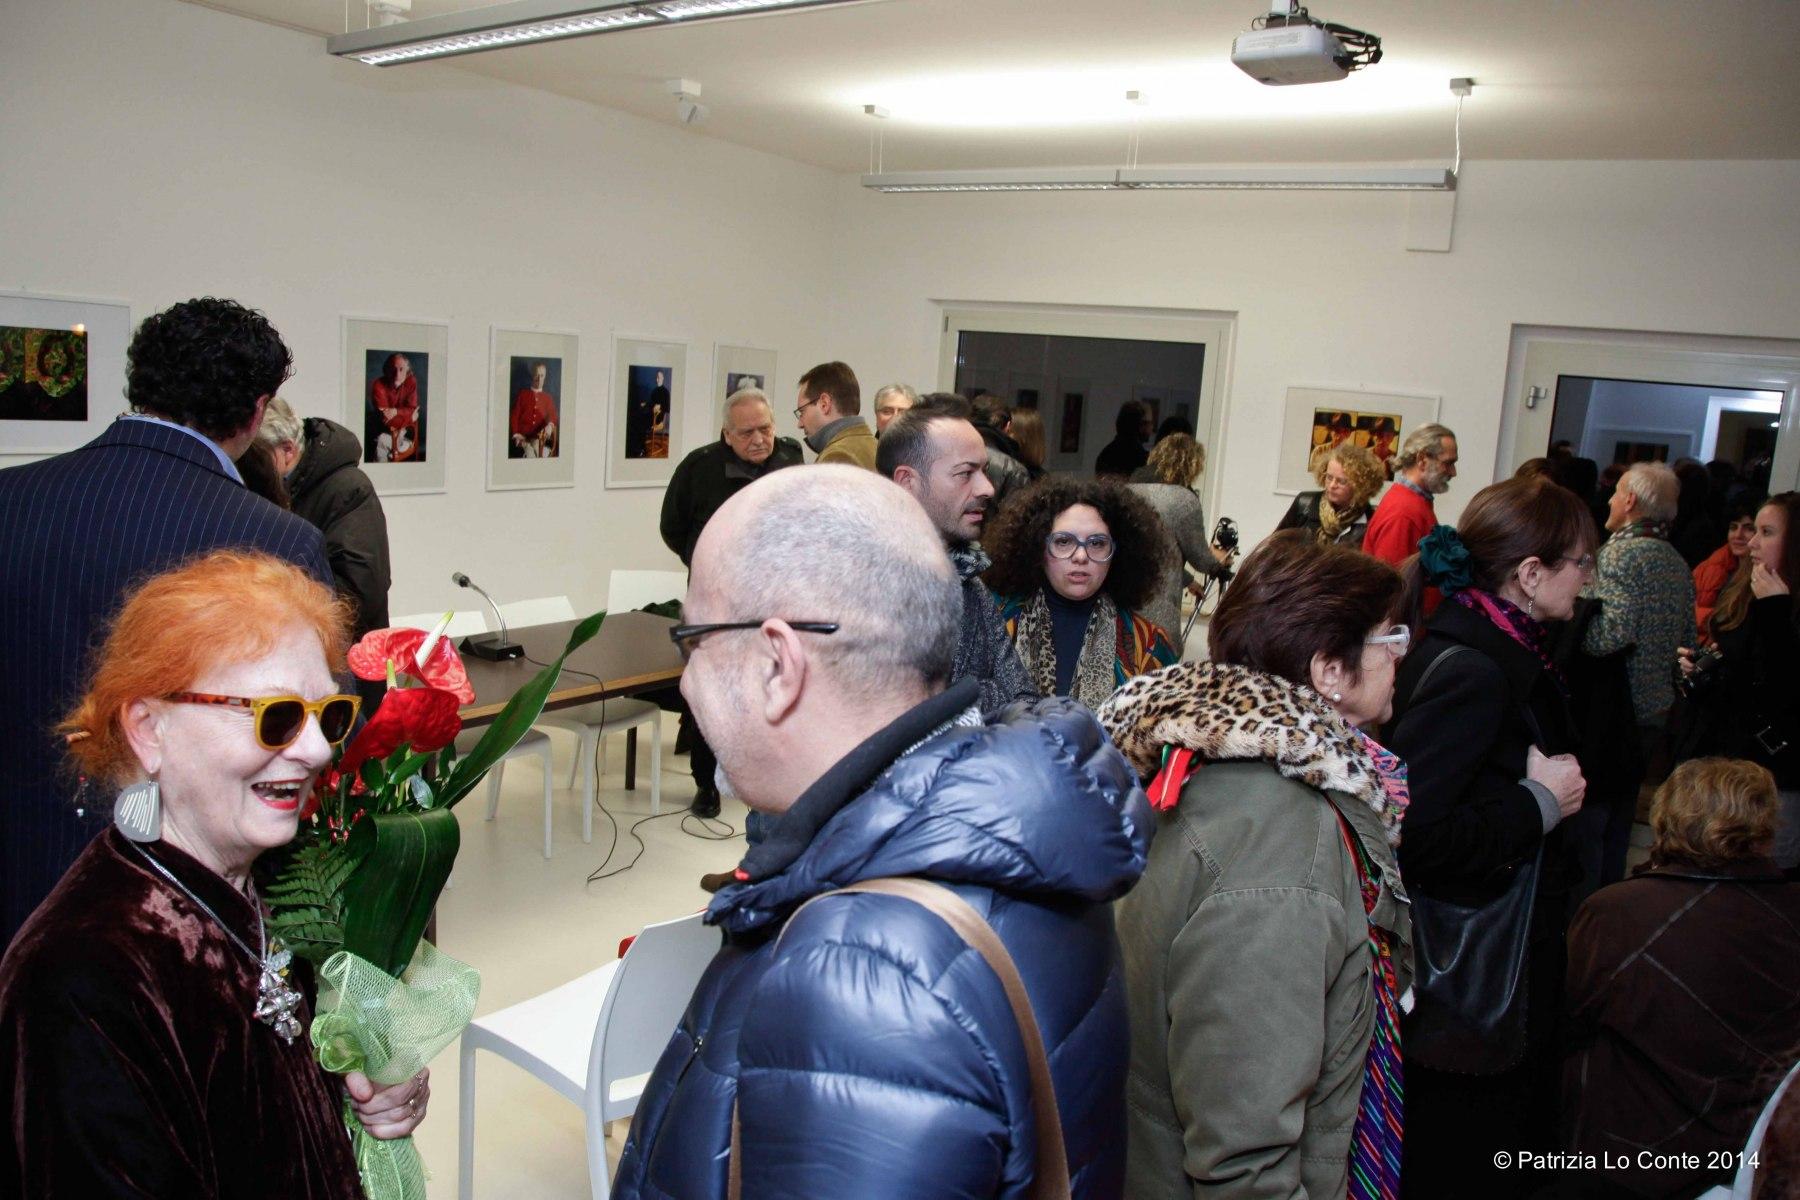 Patrizia-Lo-Conte-Mulas-museo-Nori-2014-3277